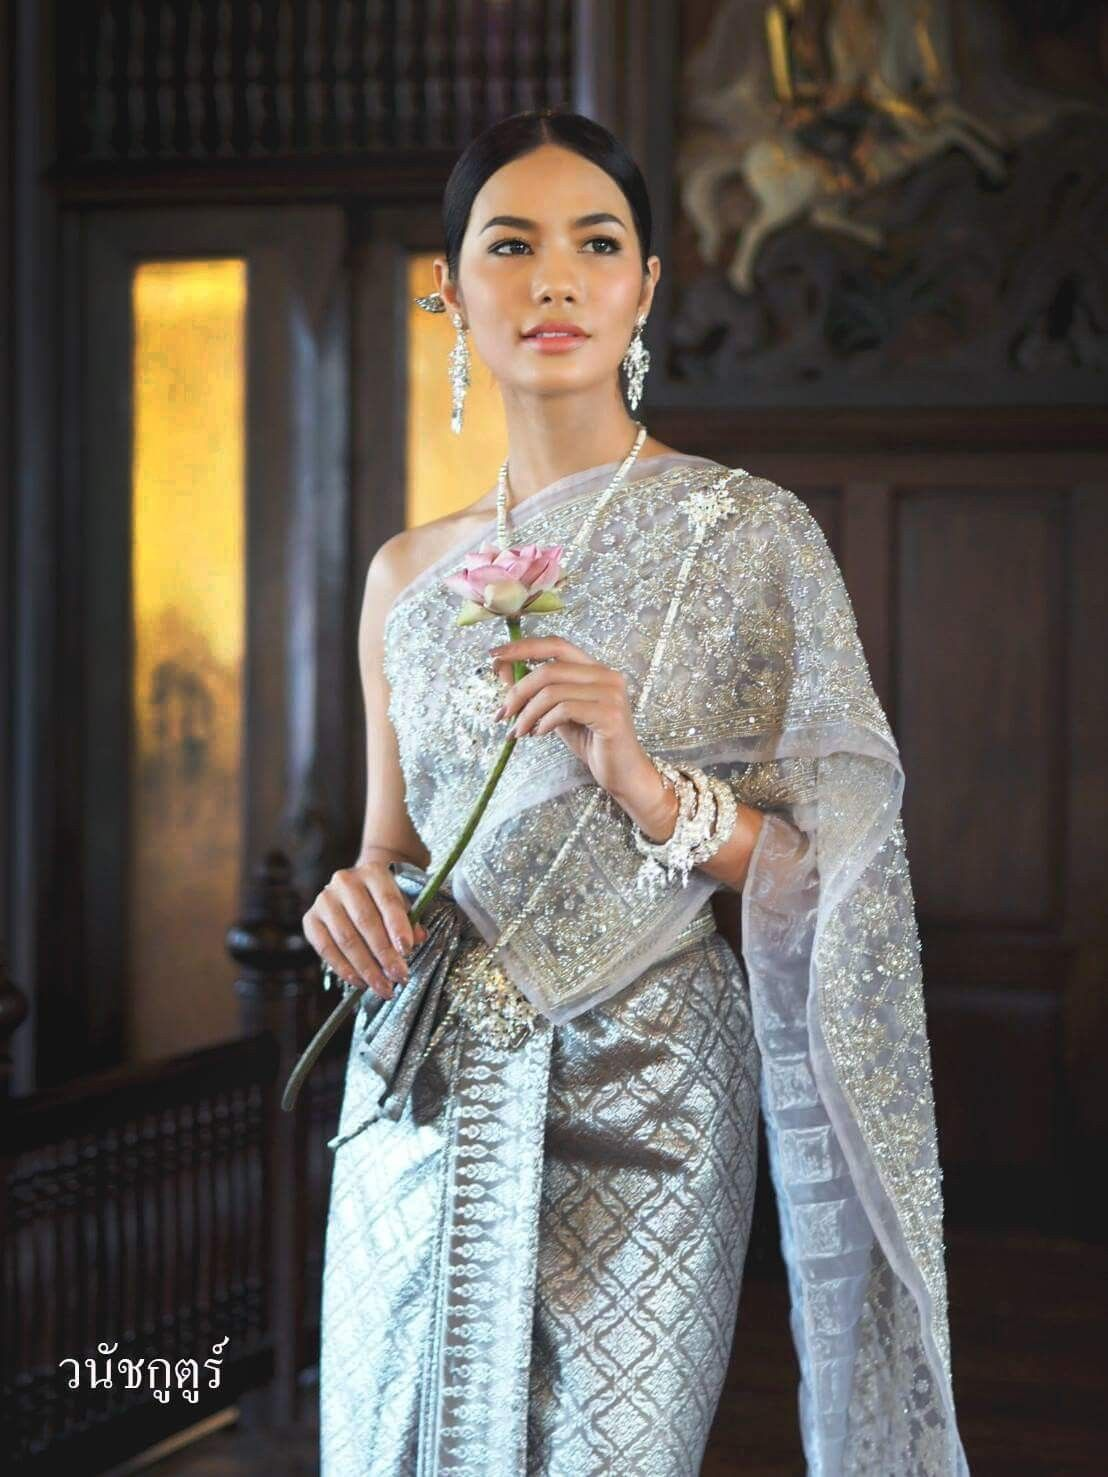 Pin by Ice-Yaa Benedicita on SIAM DRESS : MOVIE/TV SERIES/WEDDING ...